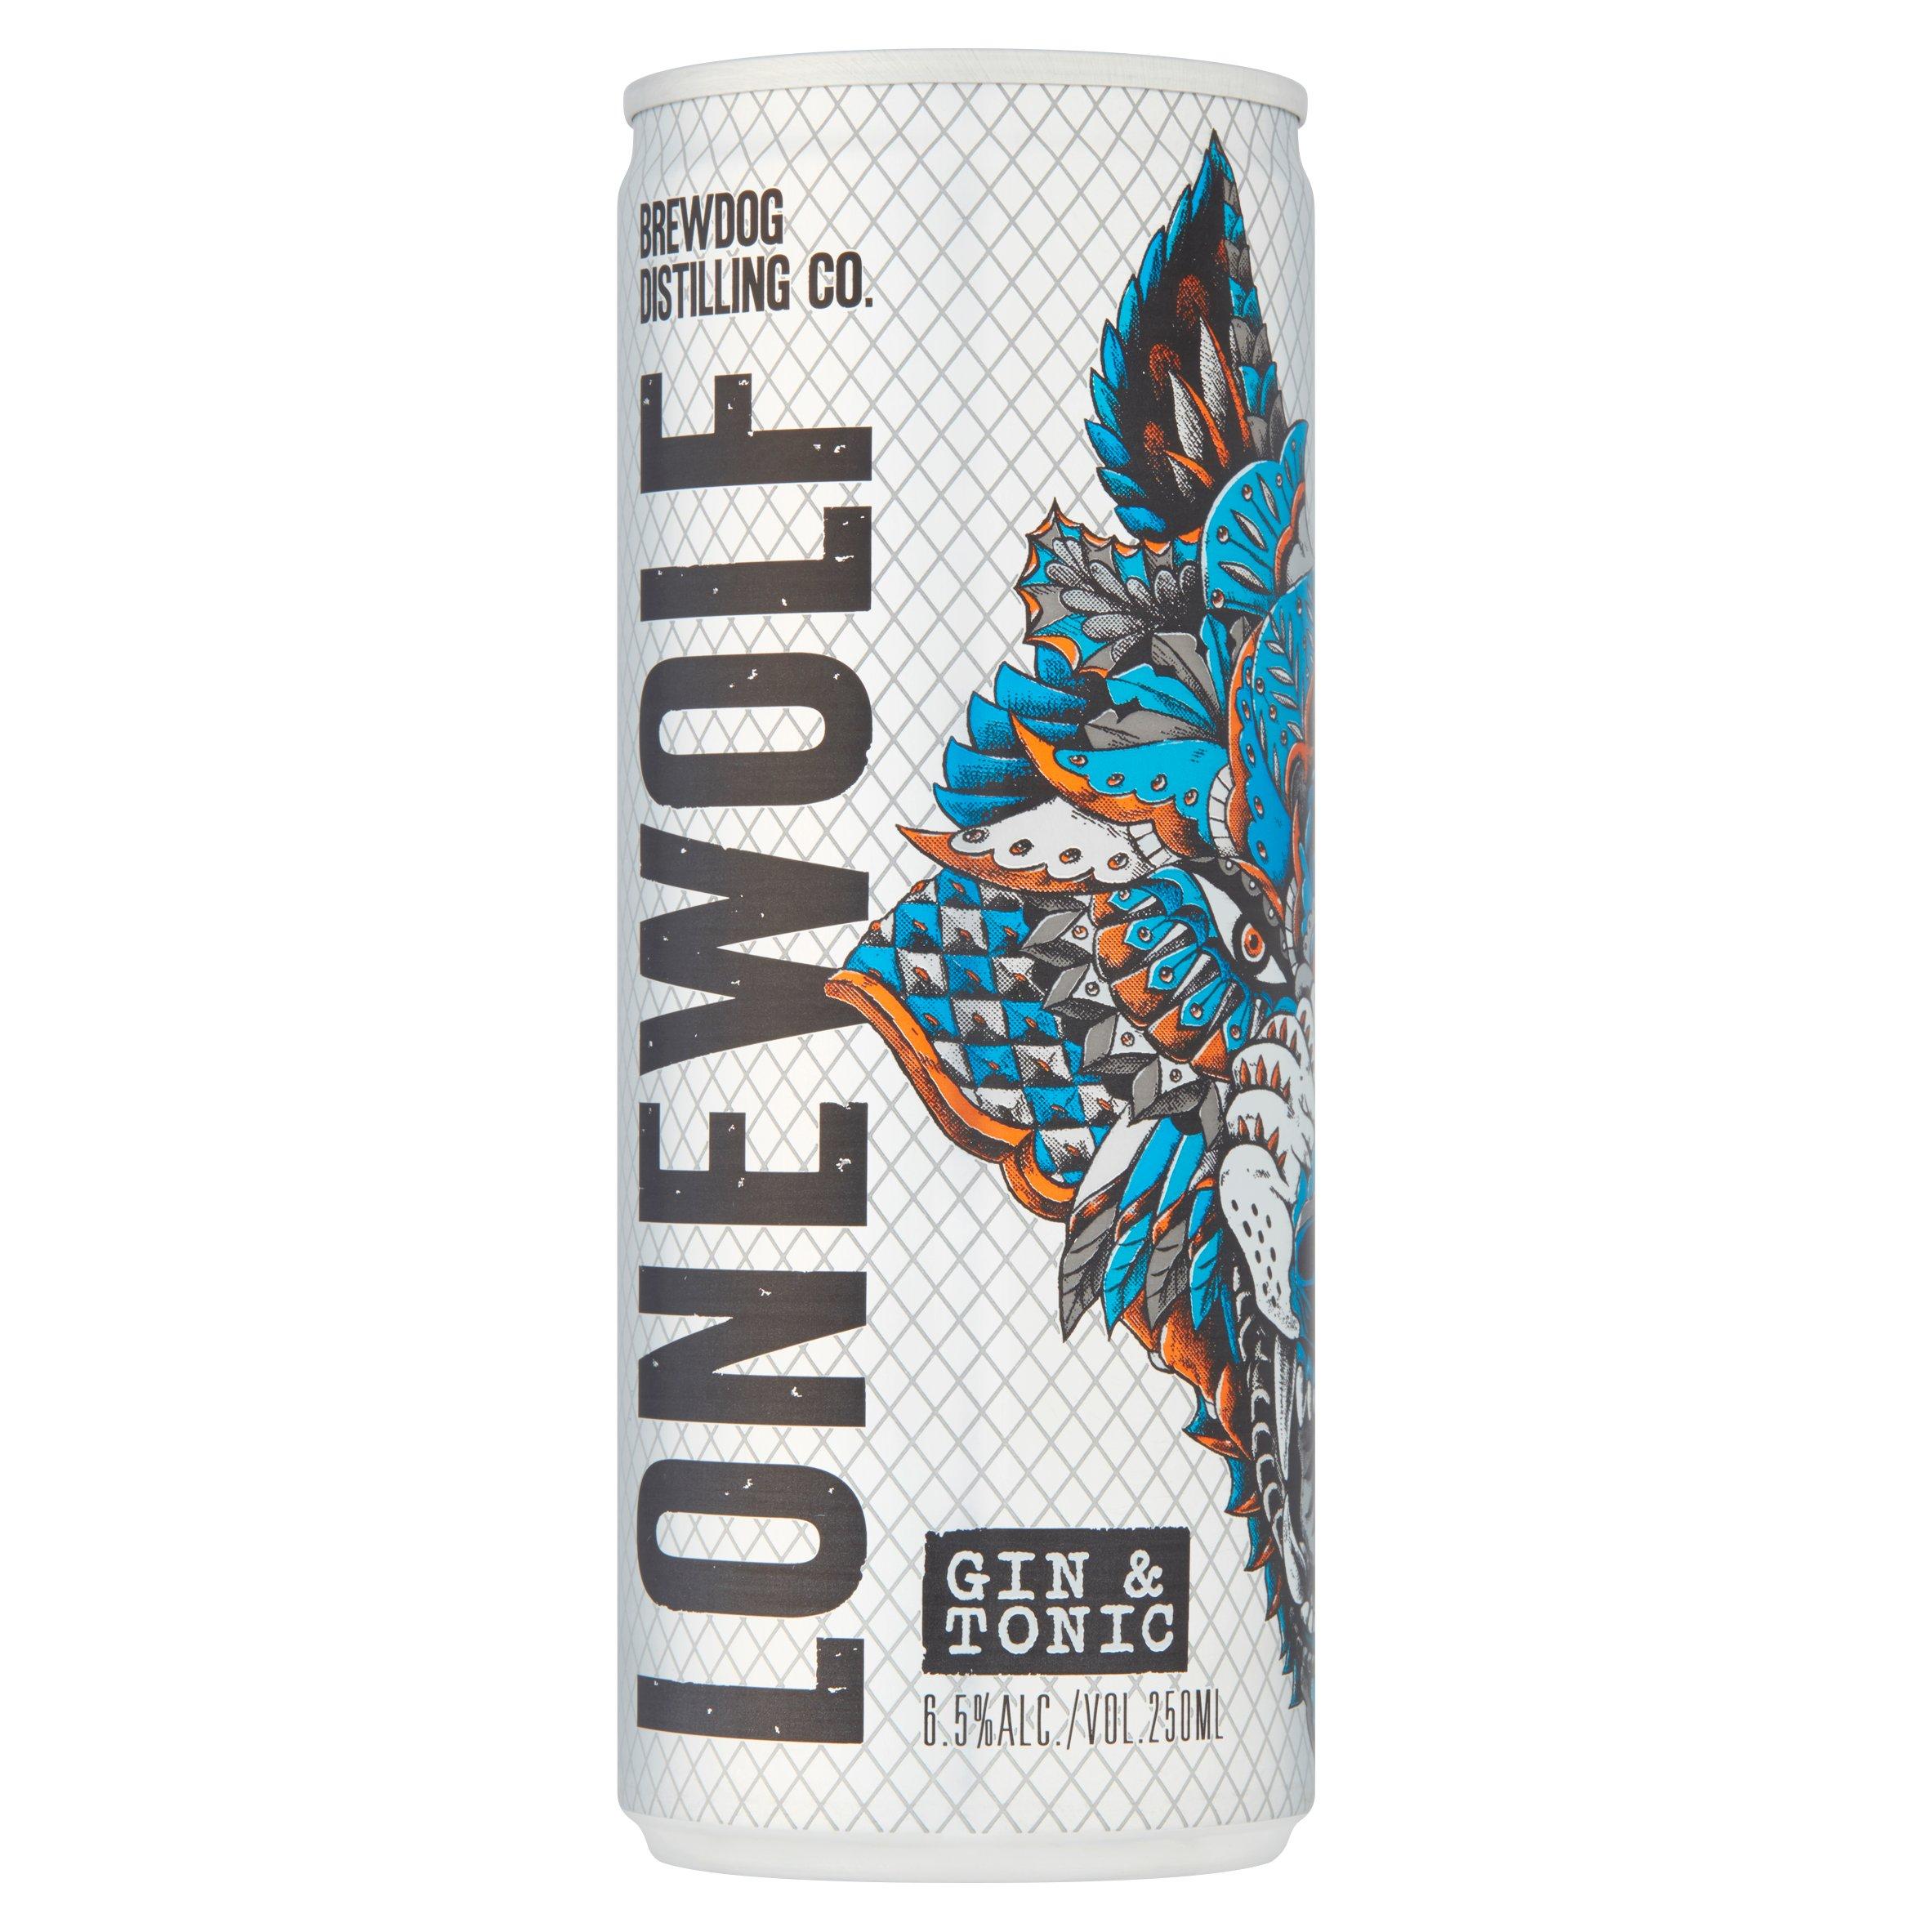 Brewdog Lonewolf Gin & Tonic 250Ml